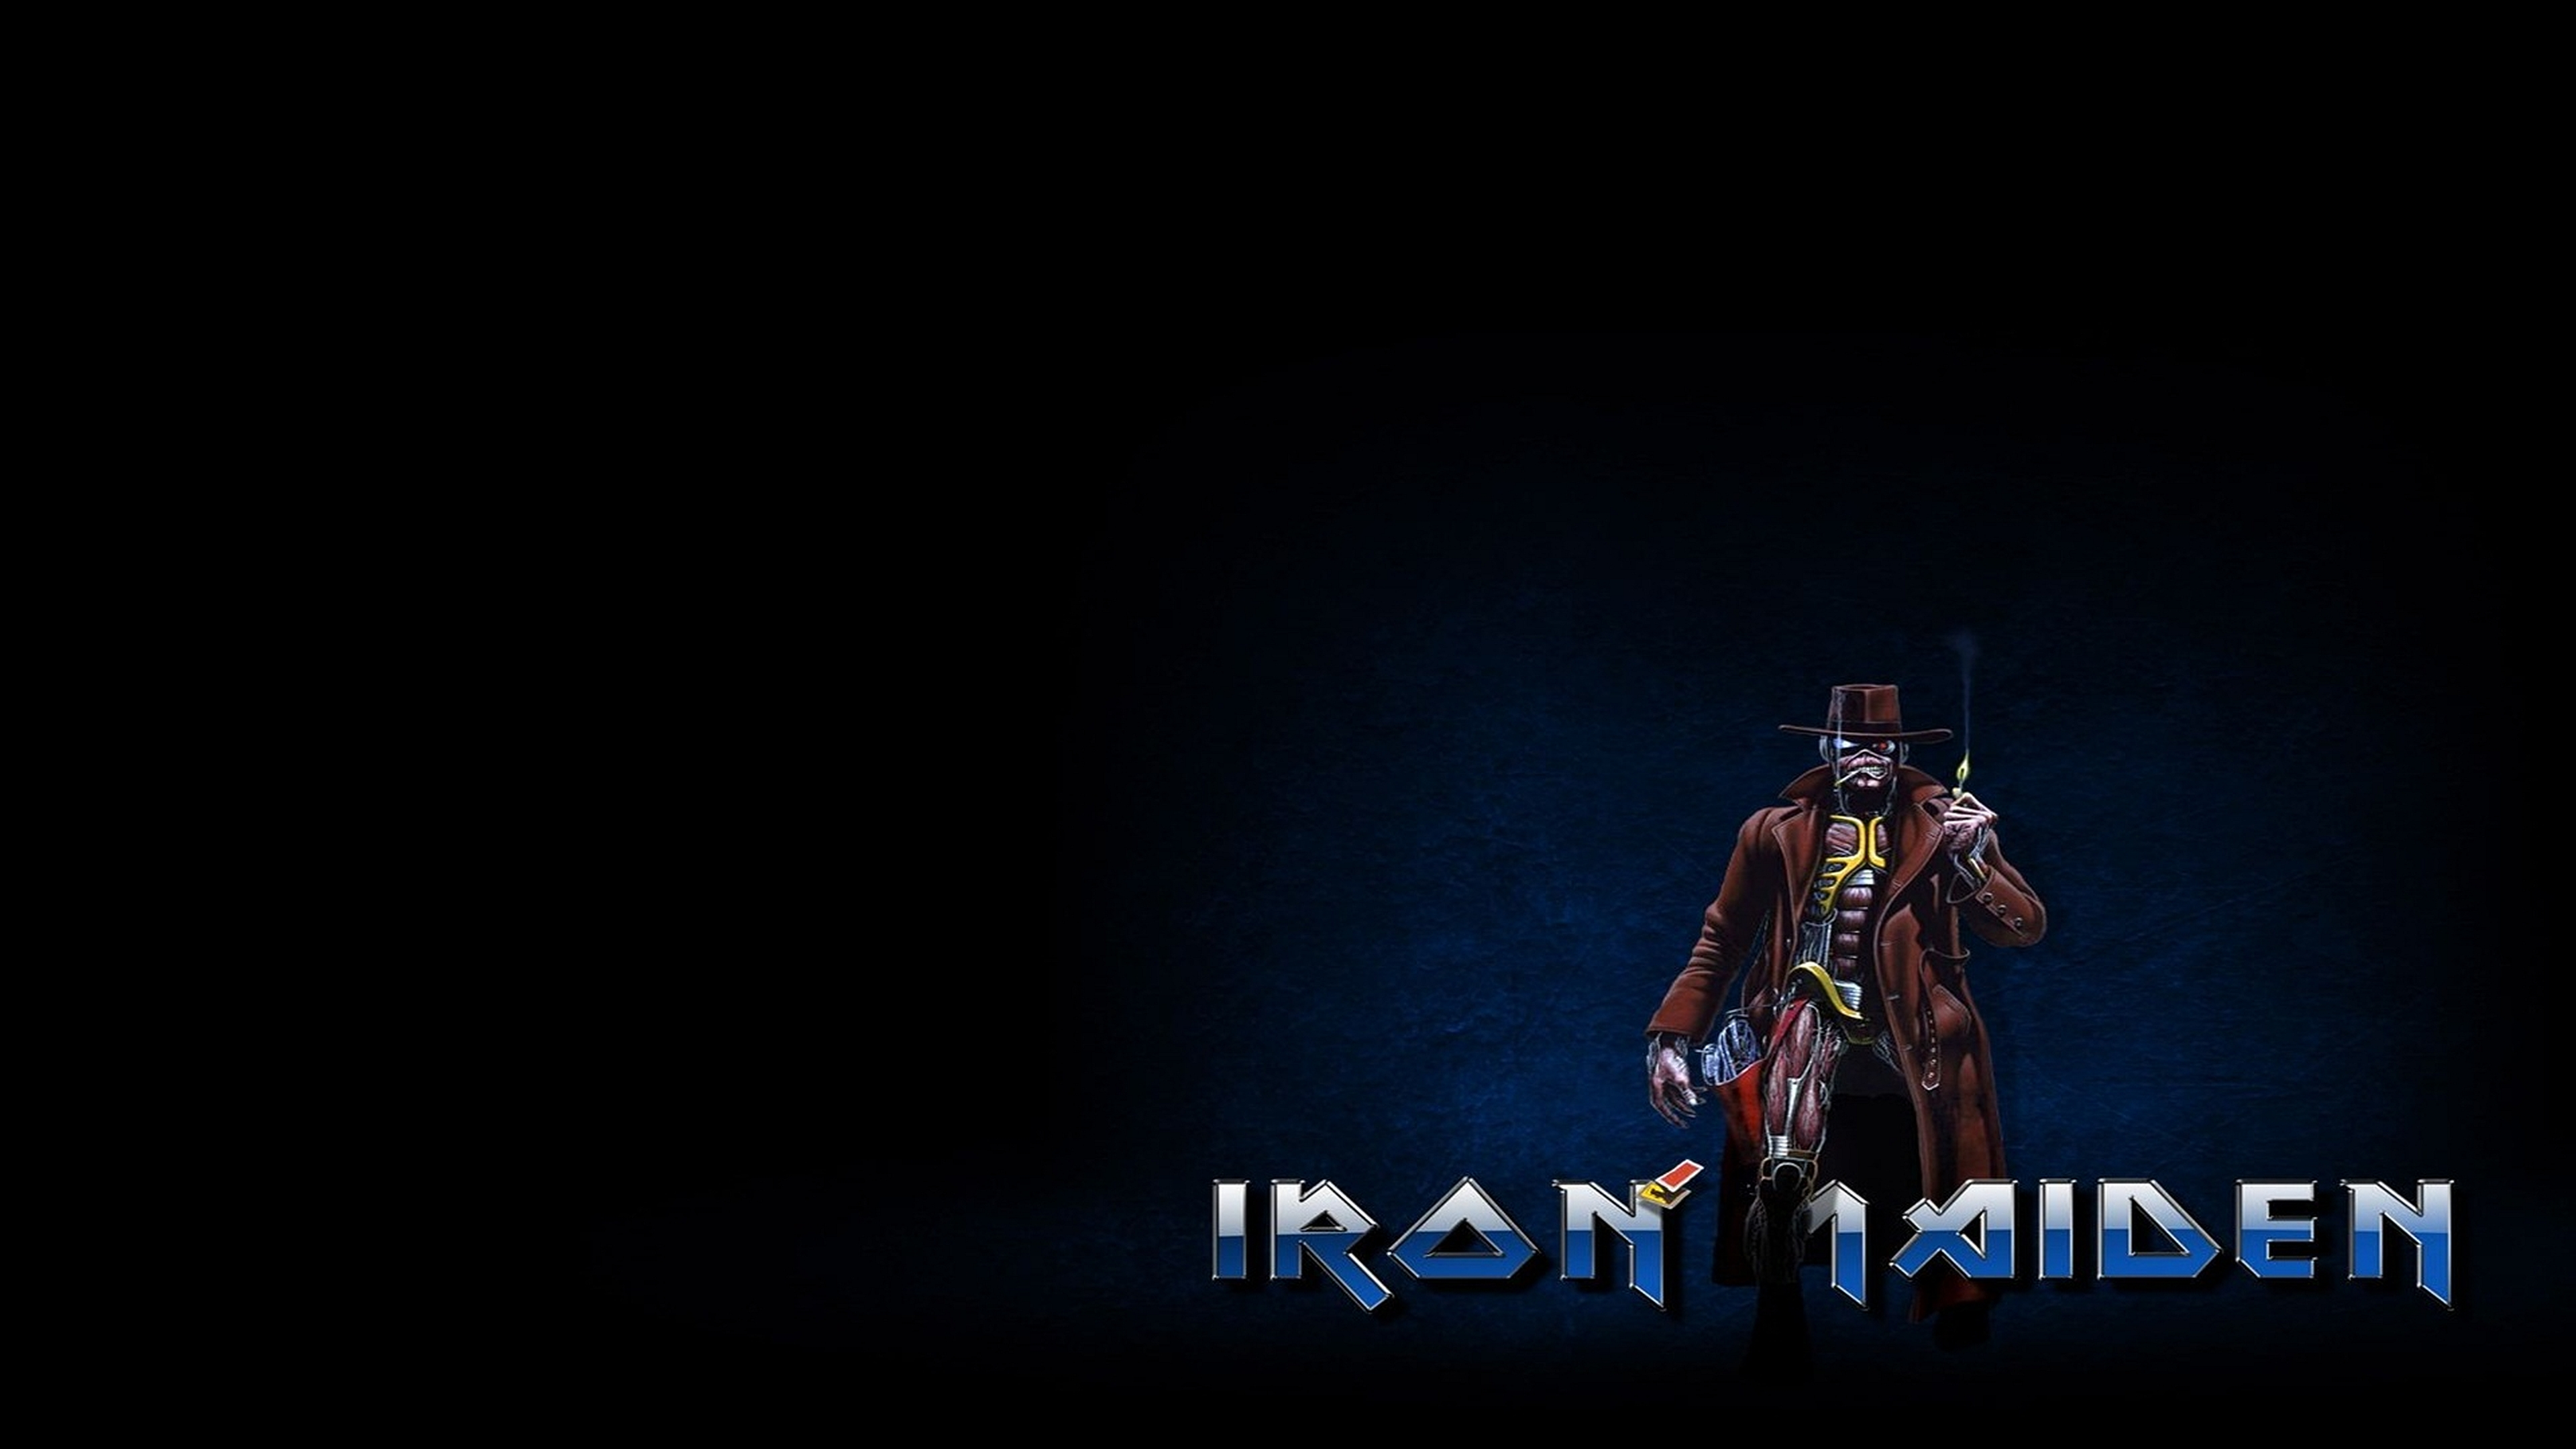 Iron Maiden Desktop Wallpaper: Iron Maiden Computer Wallpapers, Desktop Backgrounds